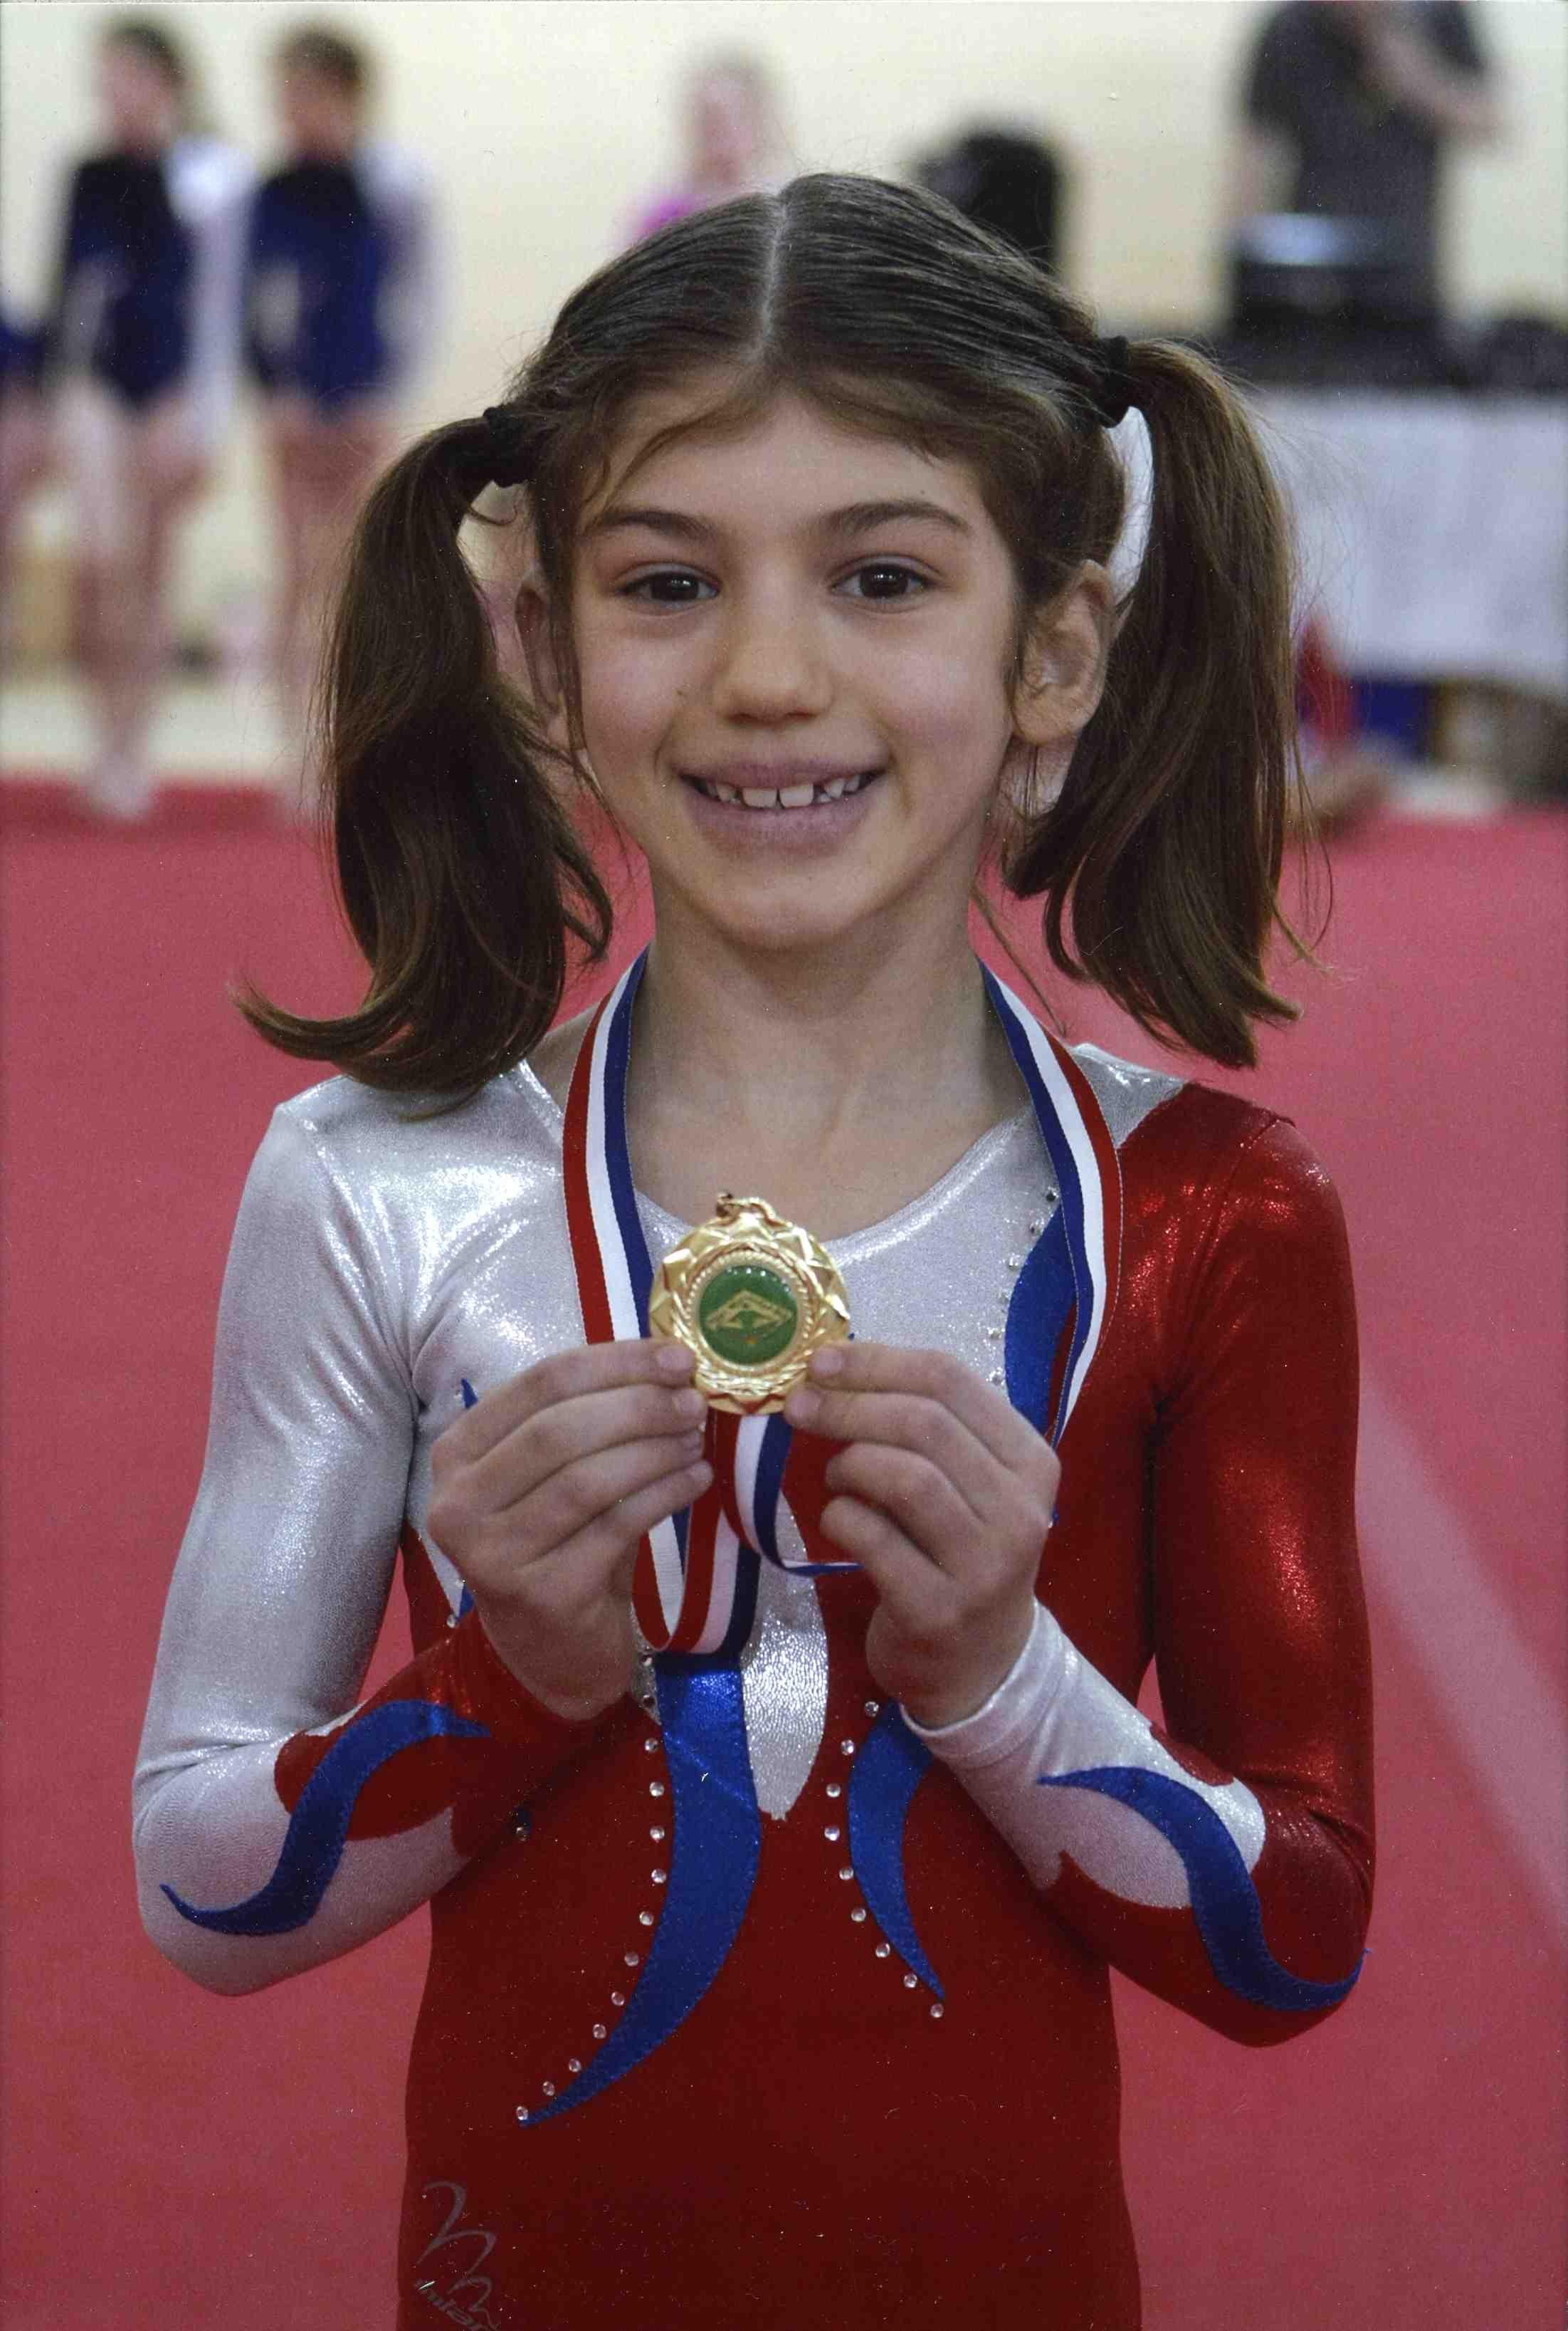 Dinah, Receives Gold Medal